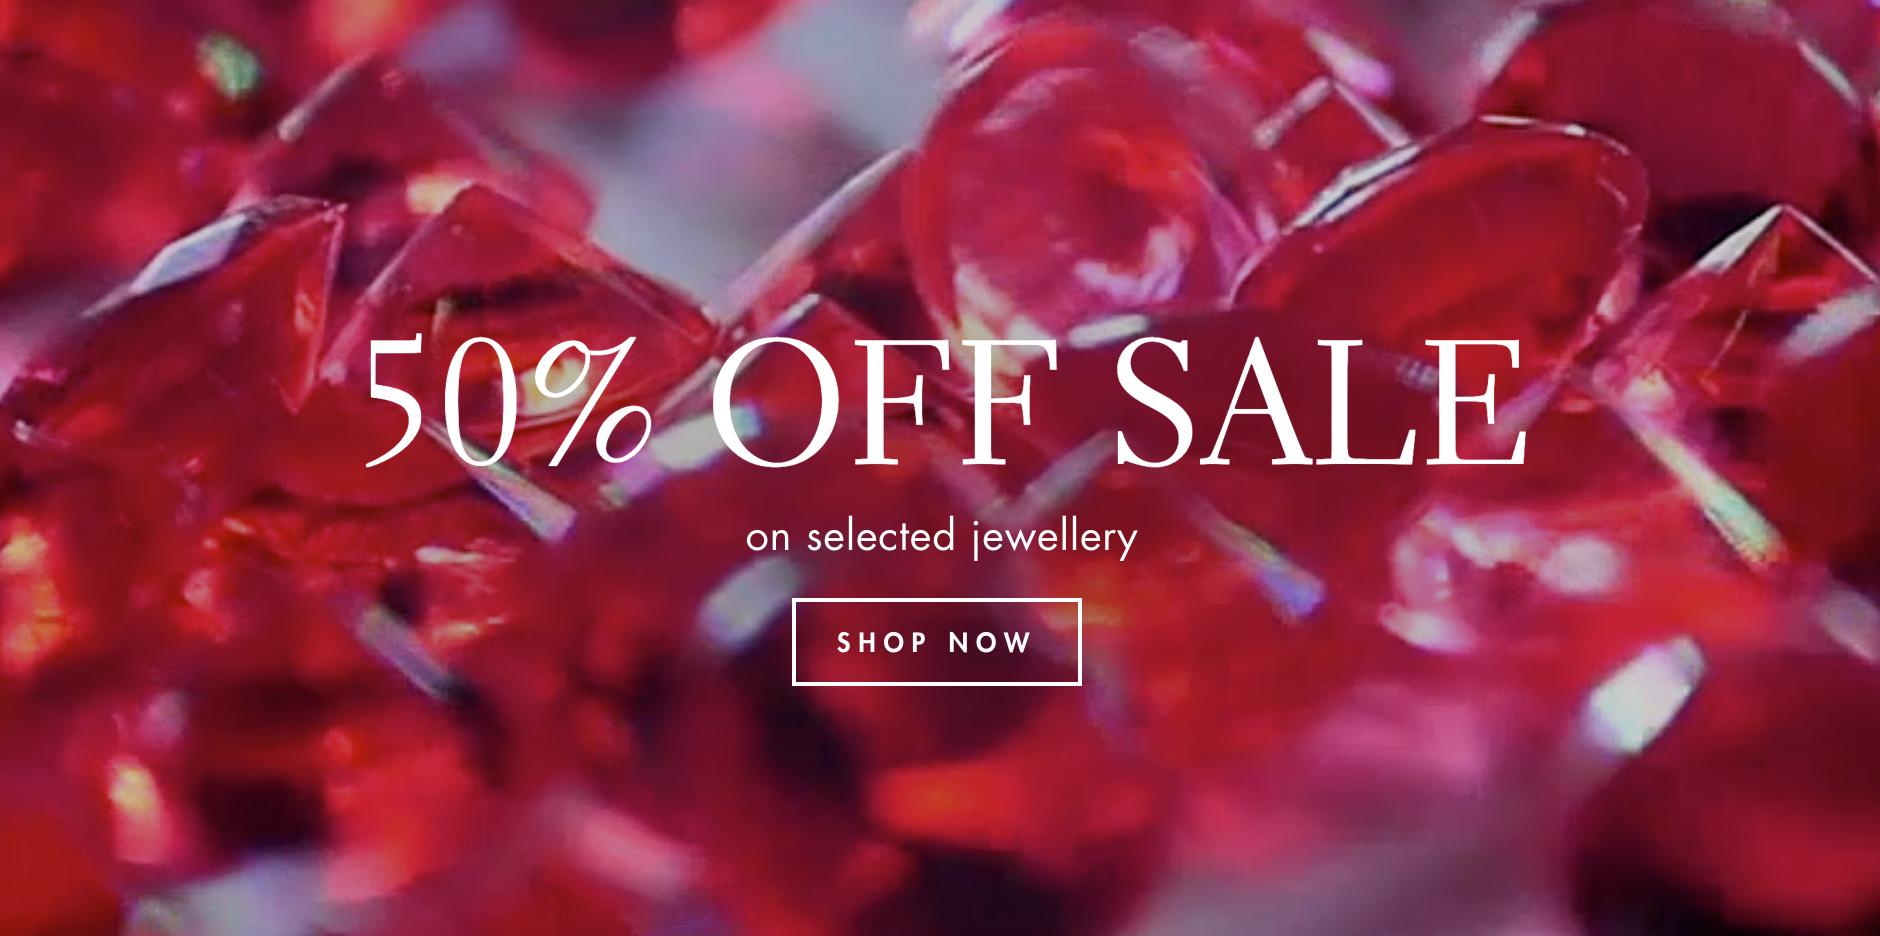 Gemondo Jewellery Gemondo Jewellery: Sale 50% off on selected jewellery